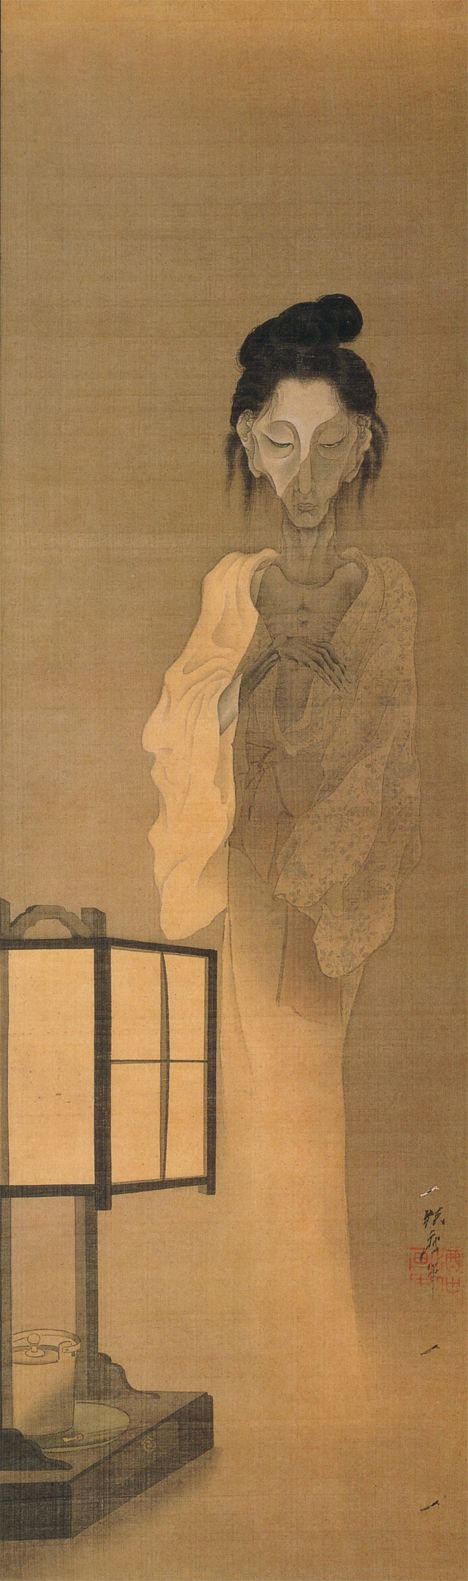 ghost painting by Meiji-period artist Kawanabe Kyōsai (1831-1889).